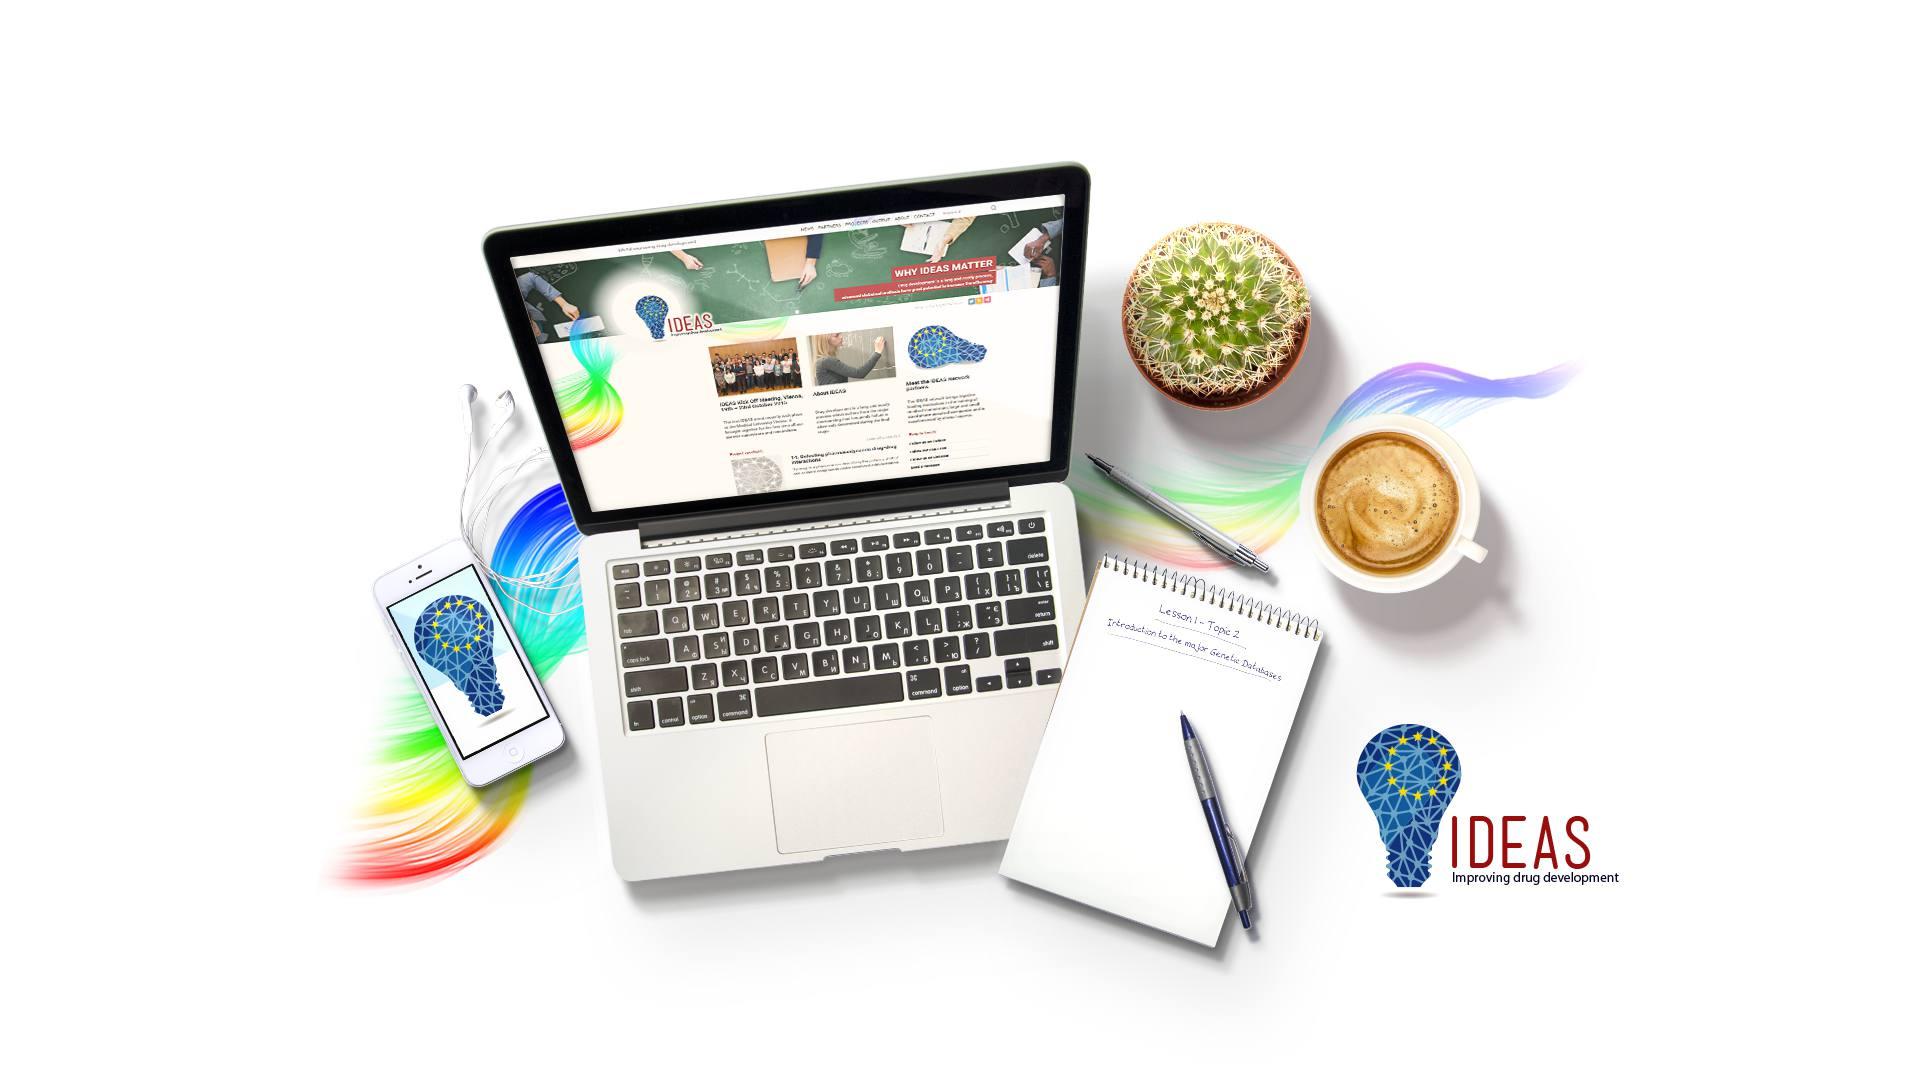 IDEAS-featured